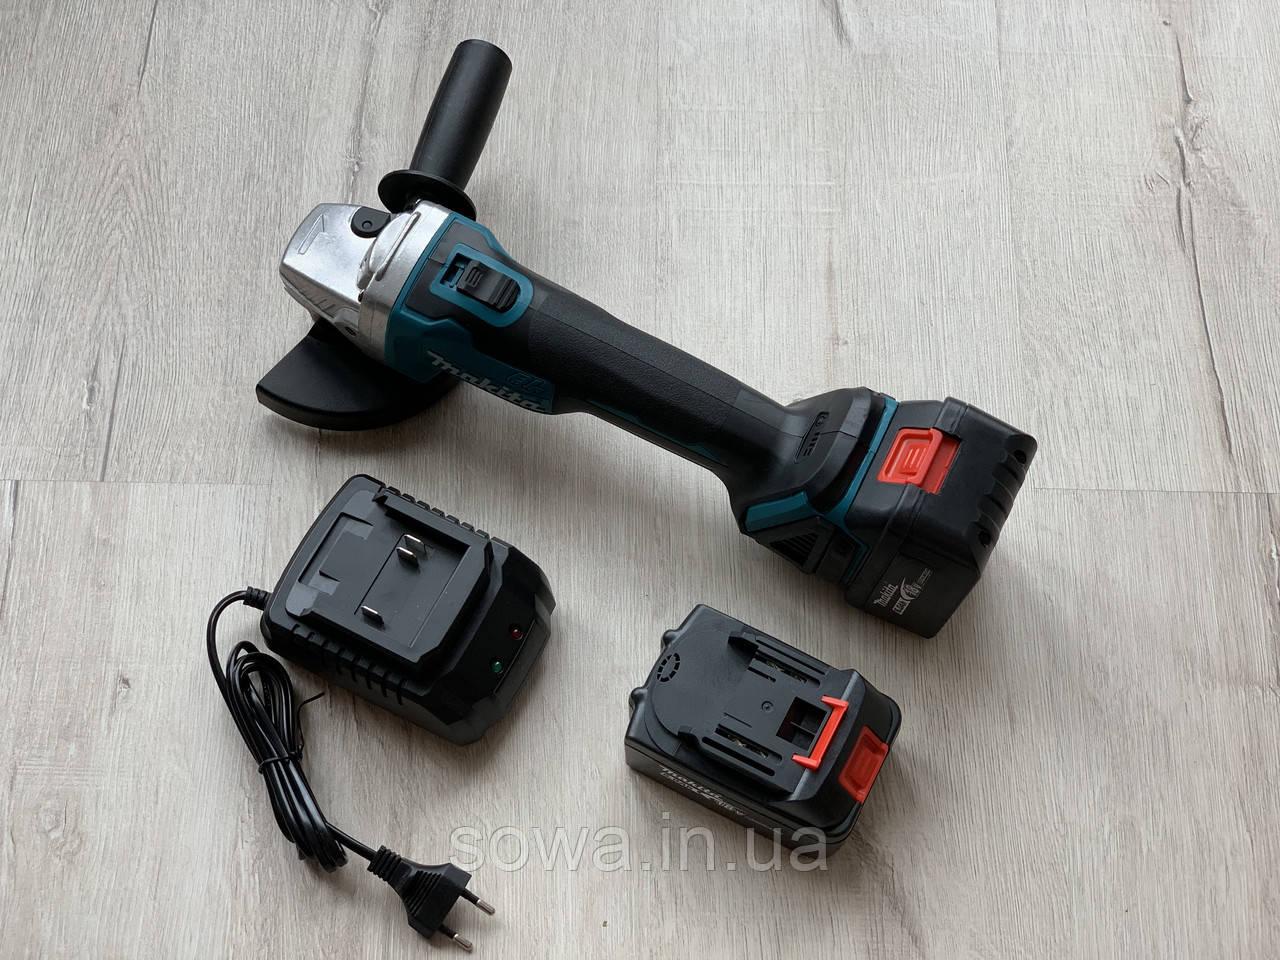 Болгарка акумуляторна безщіткова Makita DGA554 / 18V